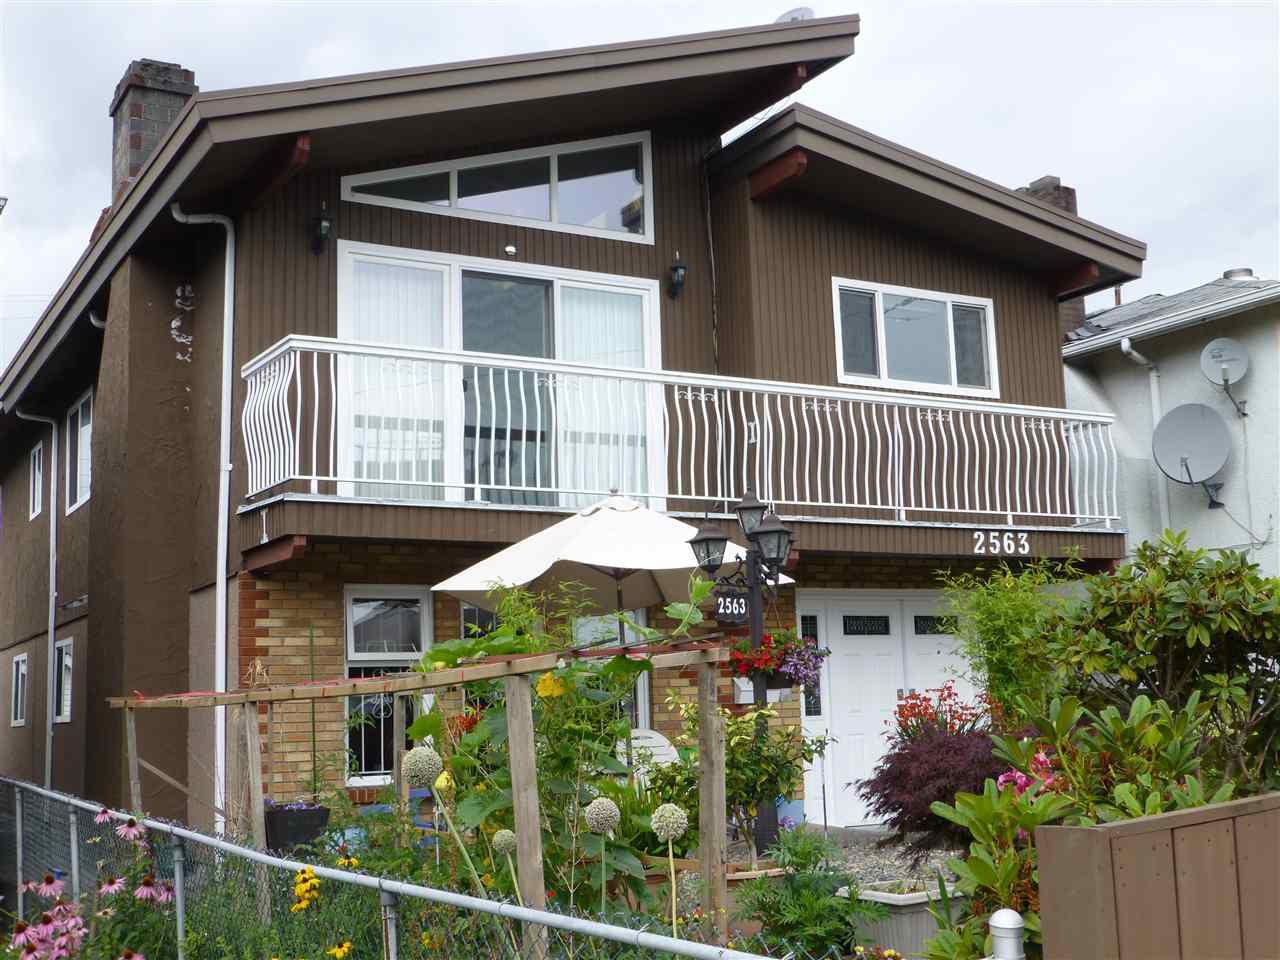 Main Photo: 2563 RENFREW Street in Vancouver: Renfrew VE House for sale (Vancouver East)  : MLS®# R2093903